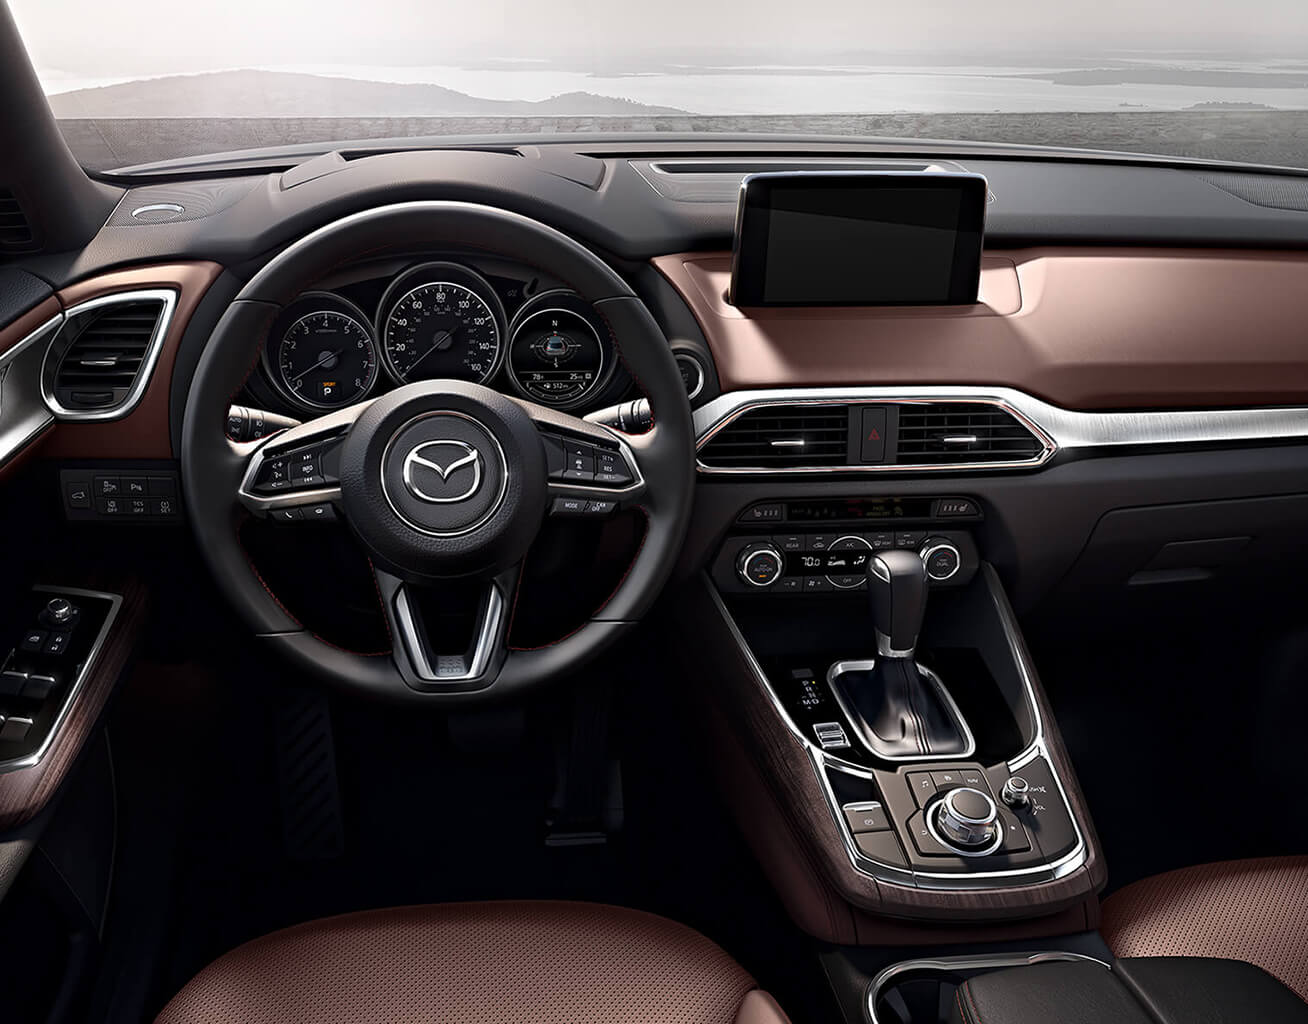 2016 Mazda Cx 9 7 Passenger Suv 3 Row Family Car Mazda Usa